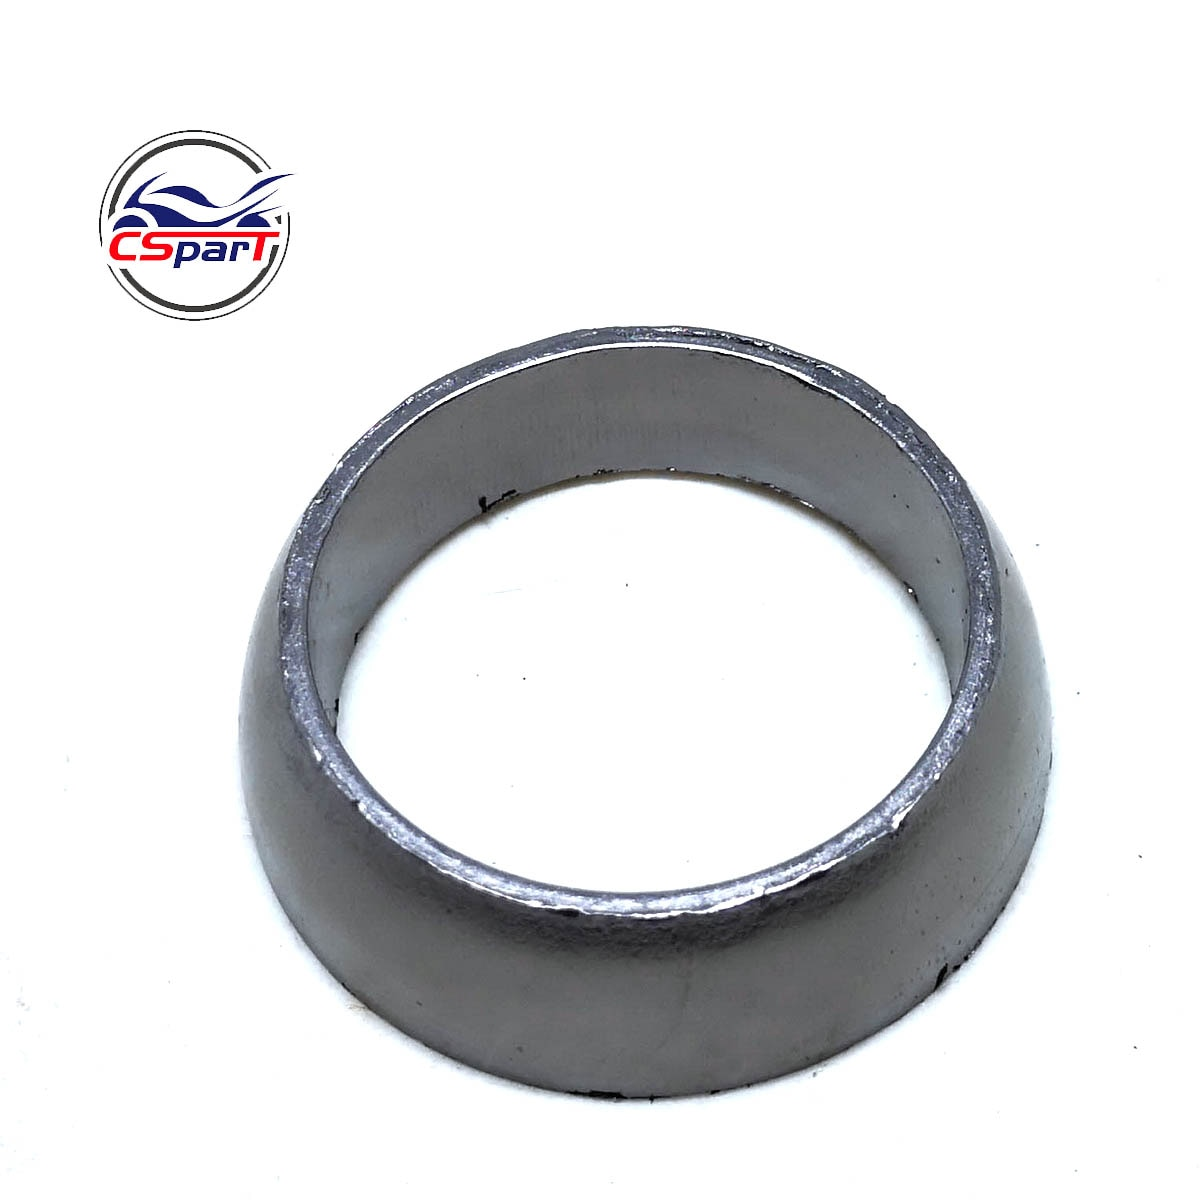 Exhaust Gasket Donut Socket Seal For Polaris Sportsman 600 700 800 3610047